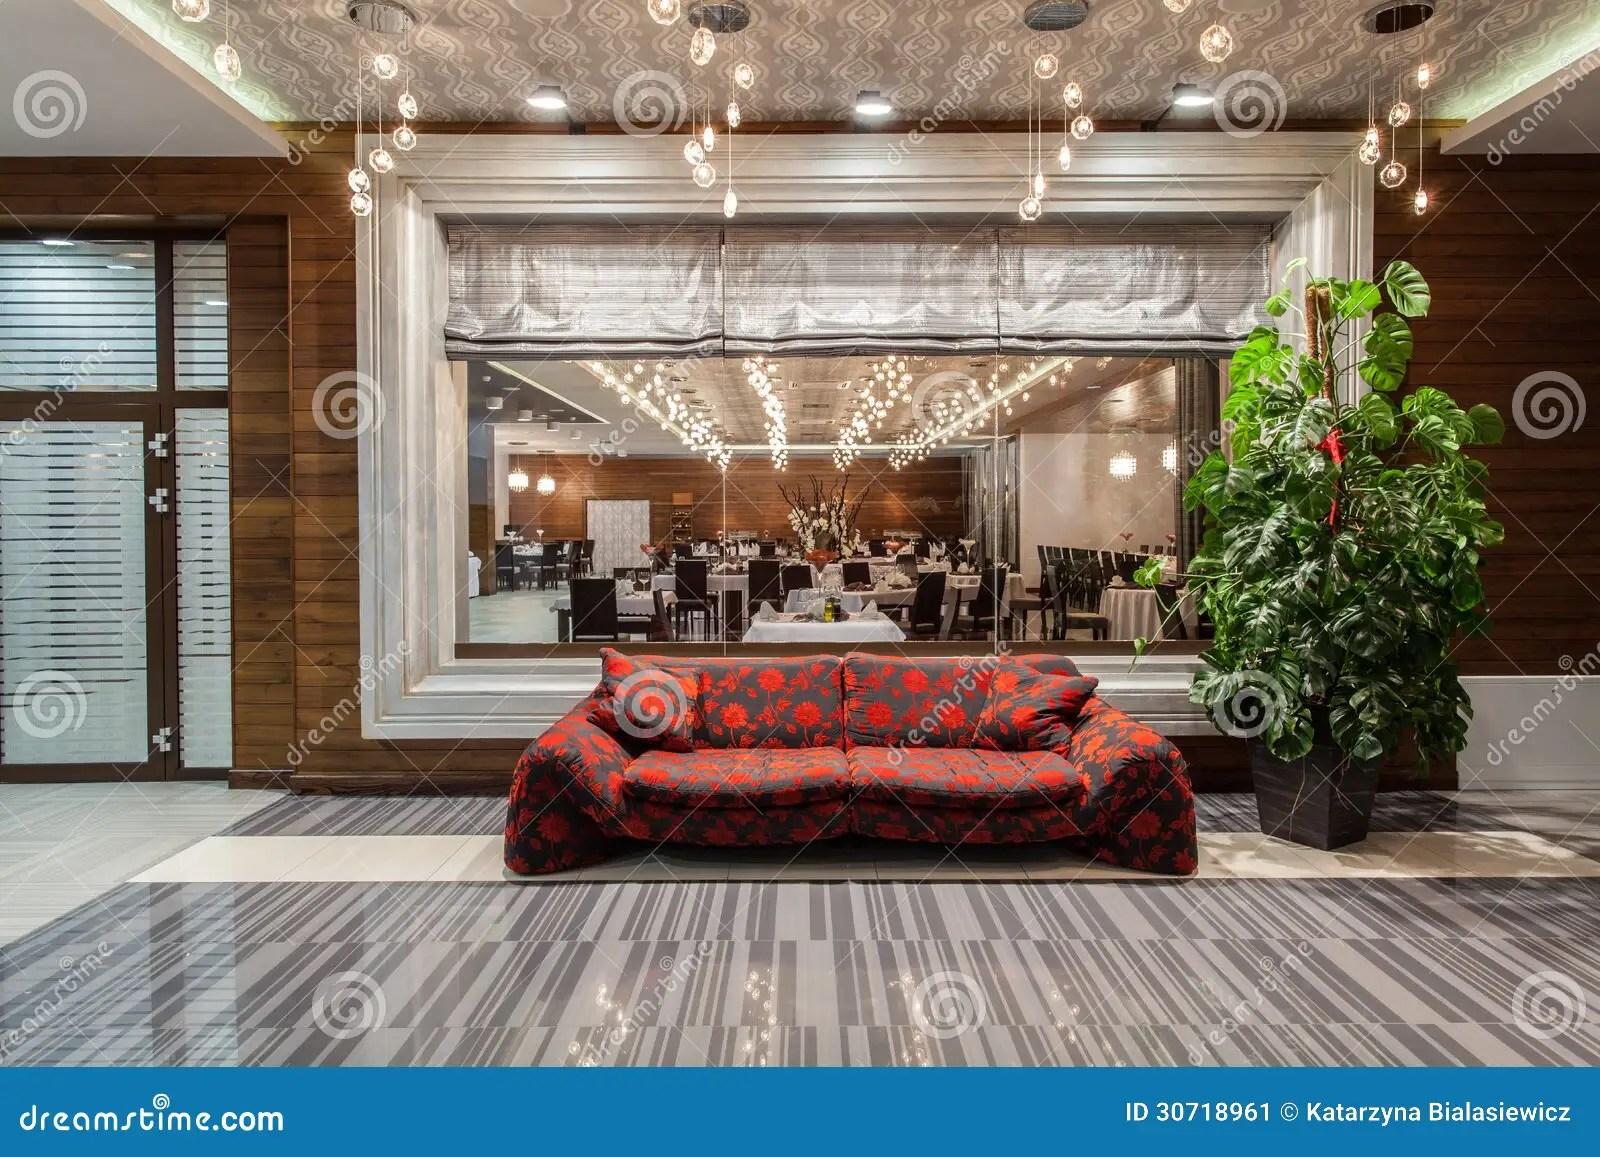 red sofa cafe baku west elm henry pull down sleeper woodland hotel decorative stock image 30718961